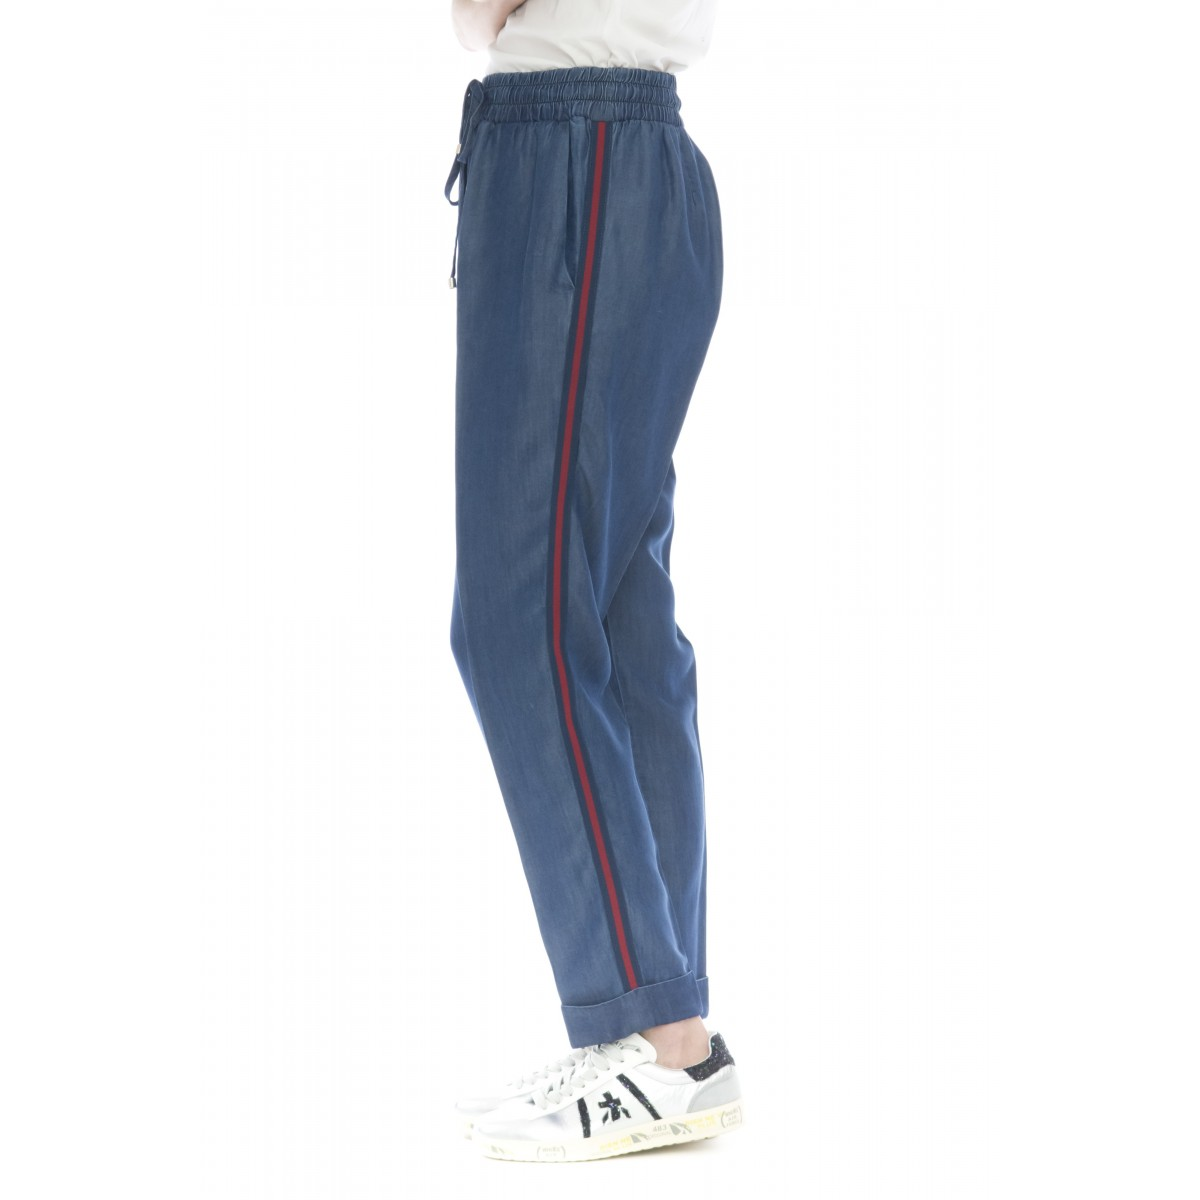 Pantalone donna - Minger pantalone jogging chambre